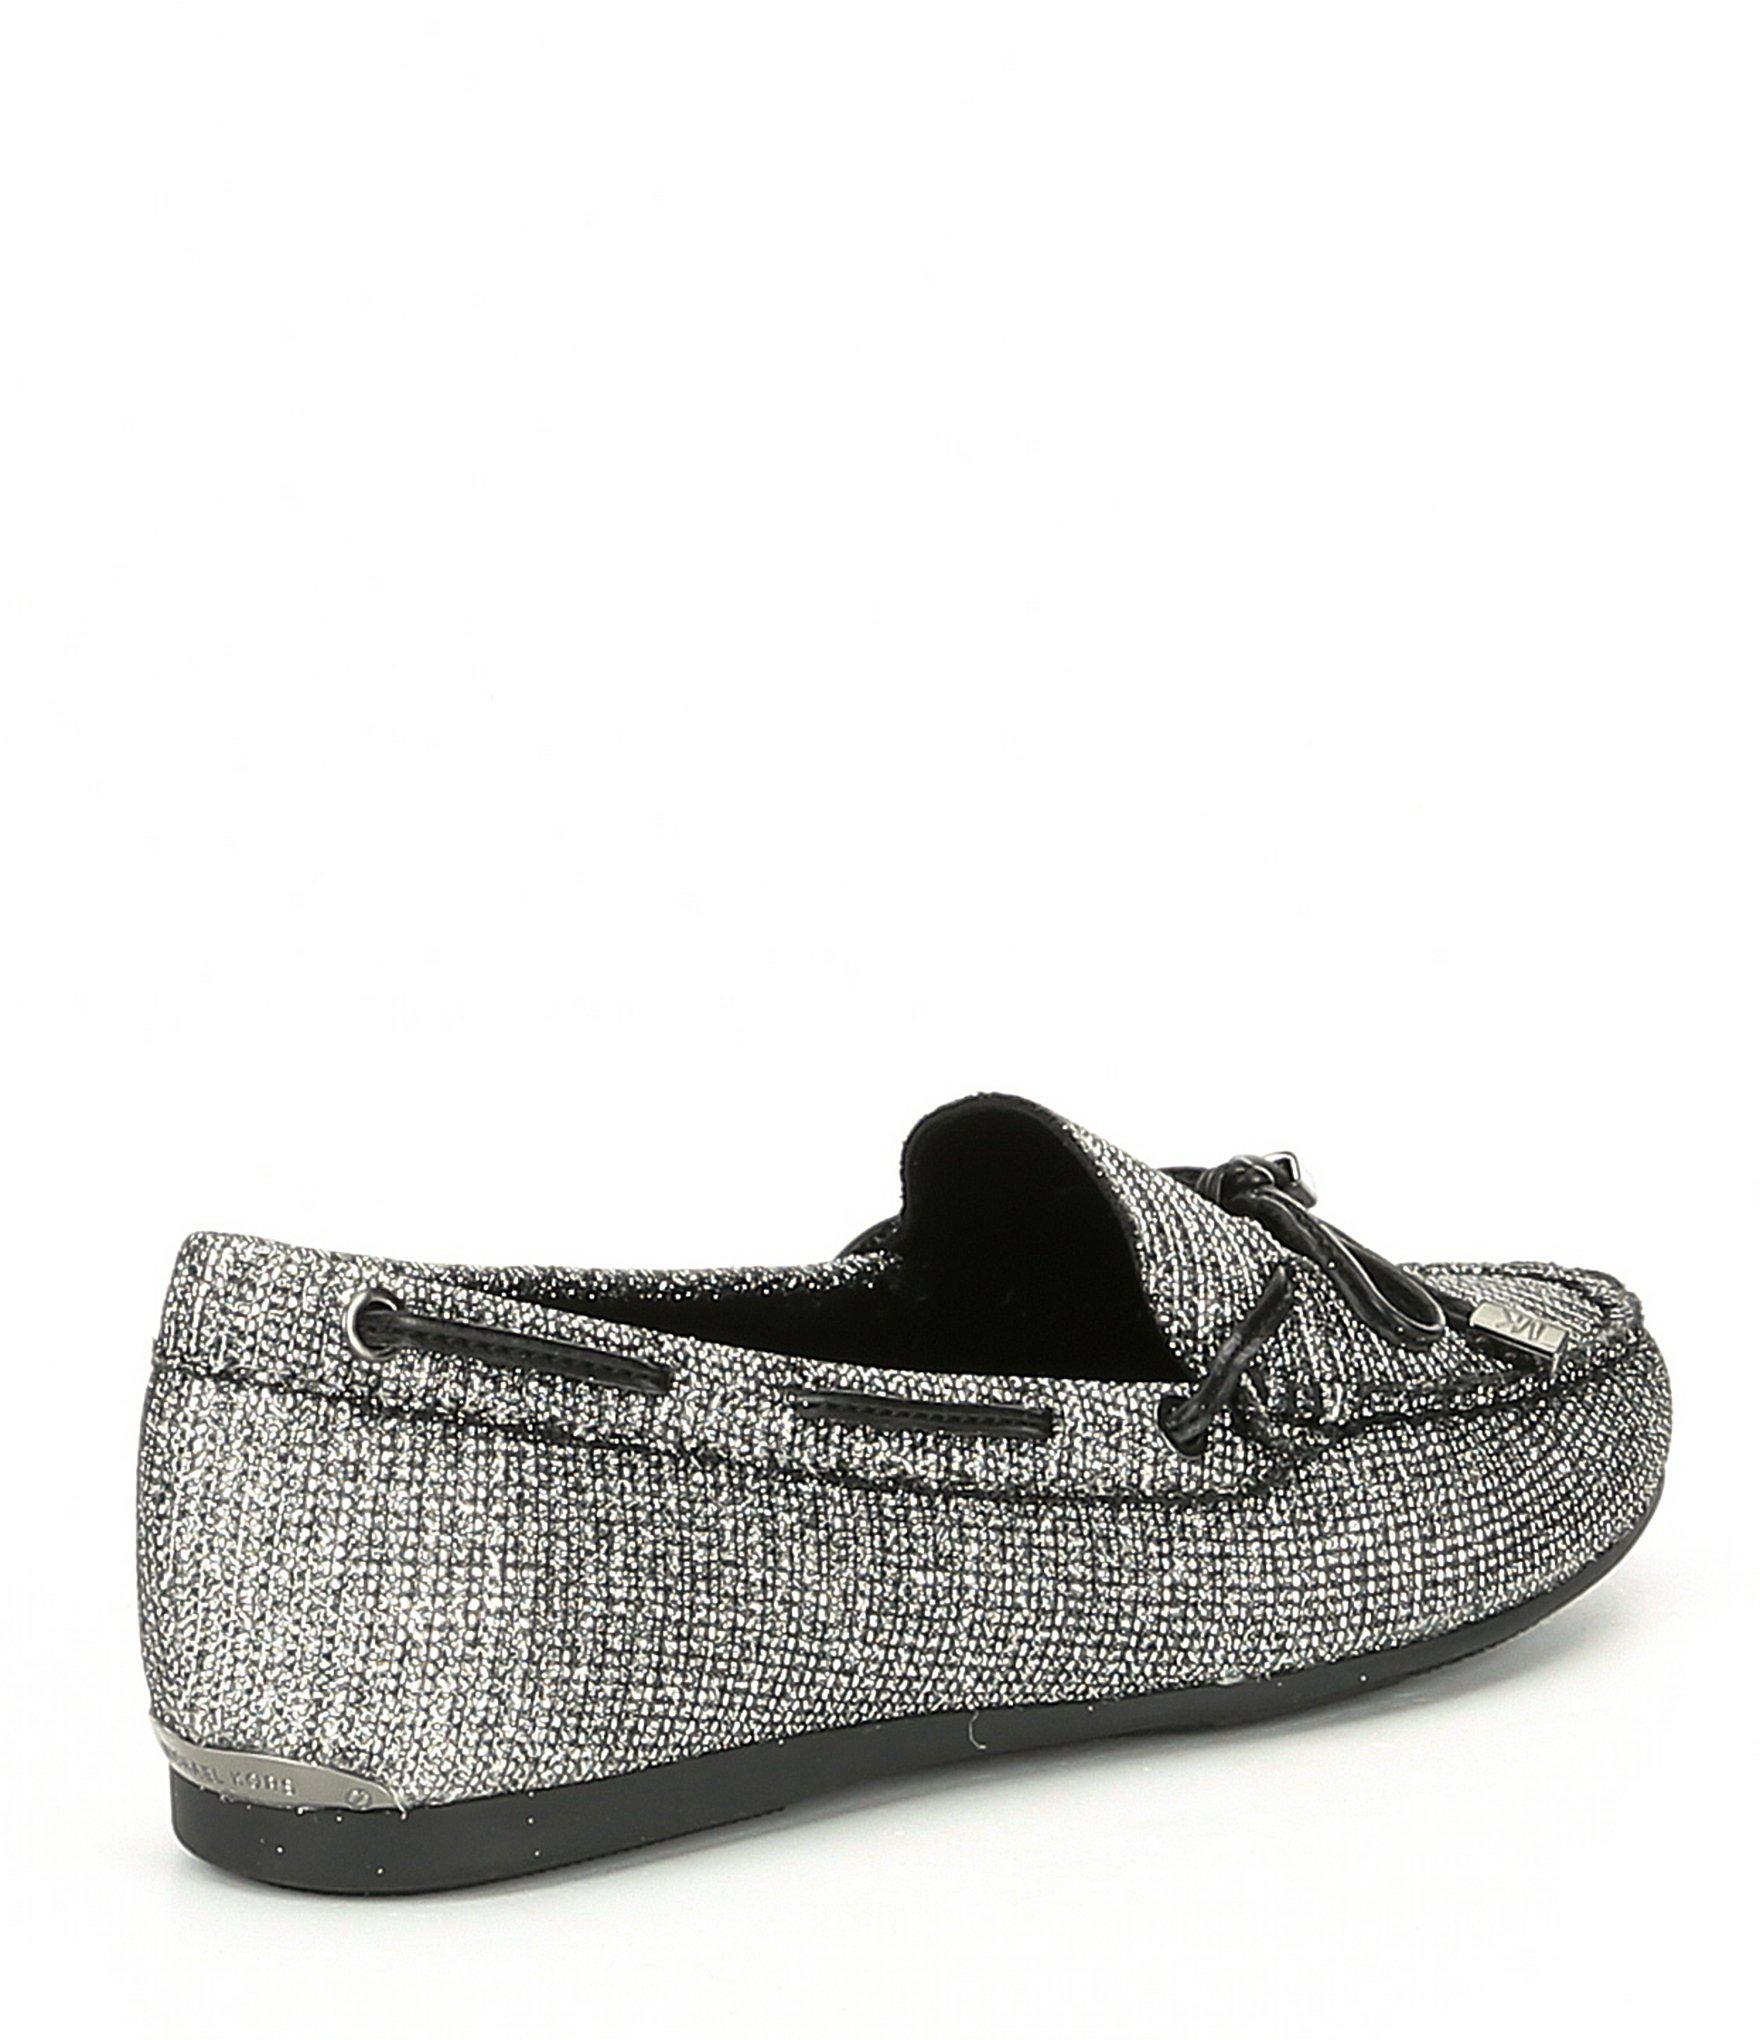 033ea32a5516f0 MICHAEL Michael Kors Sutton Glitter Chain Mesh Moc Loafers in Black ...